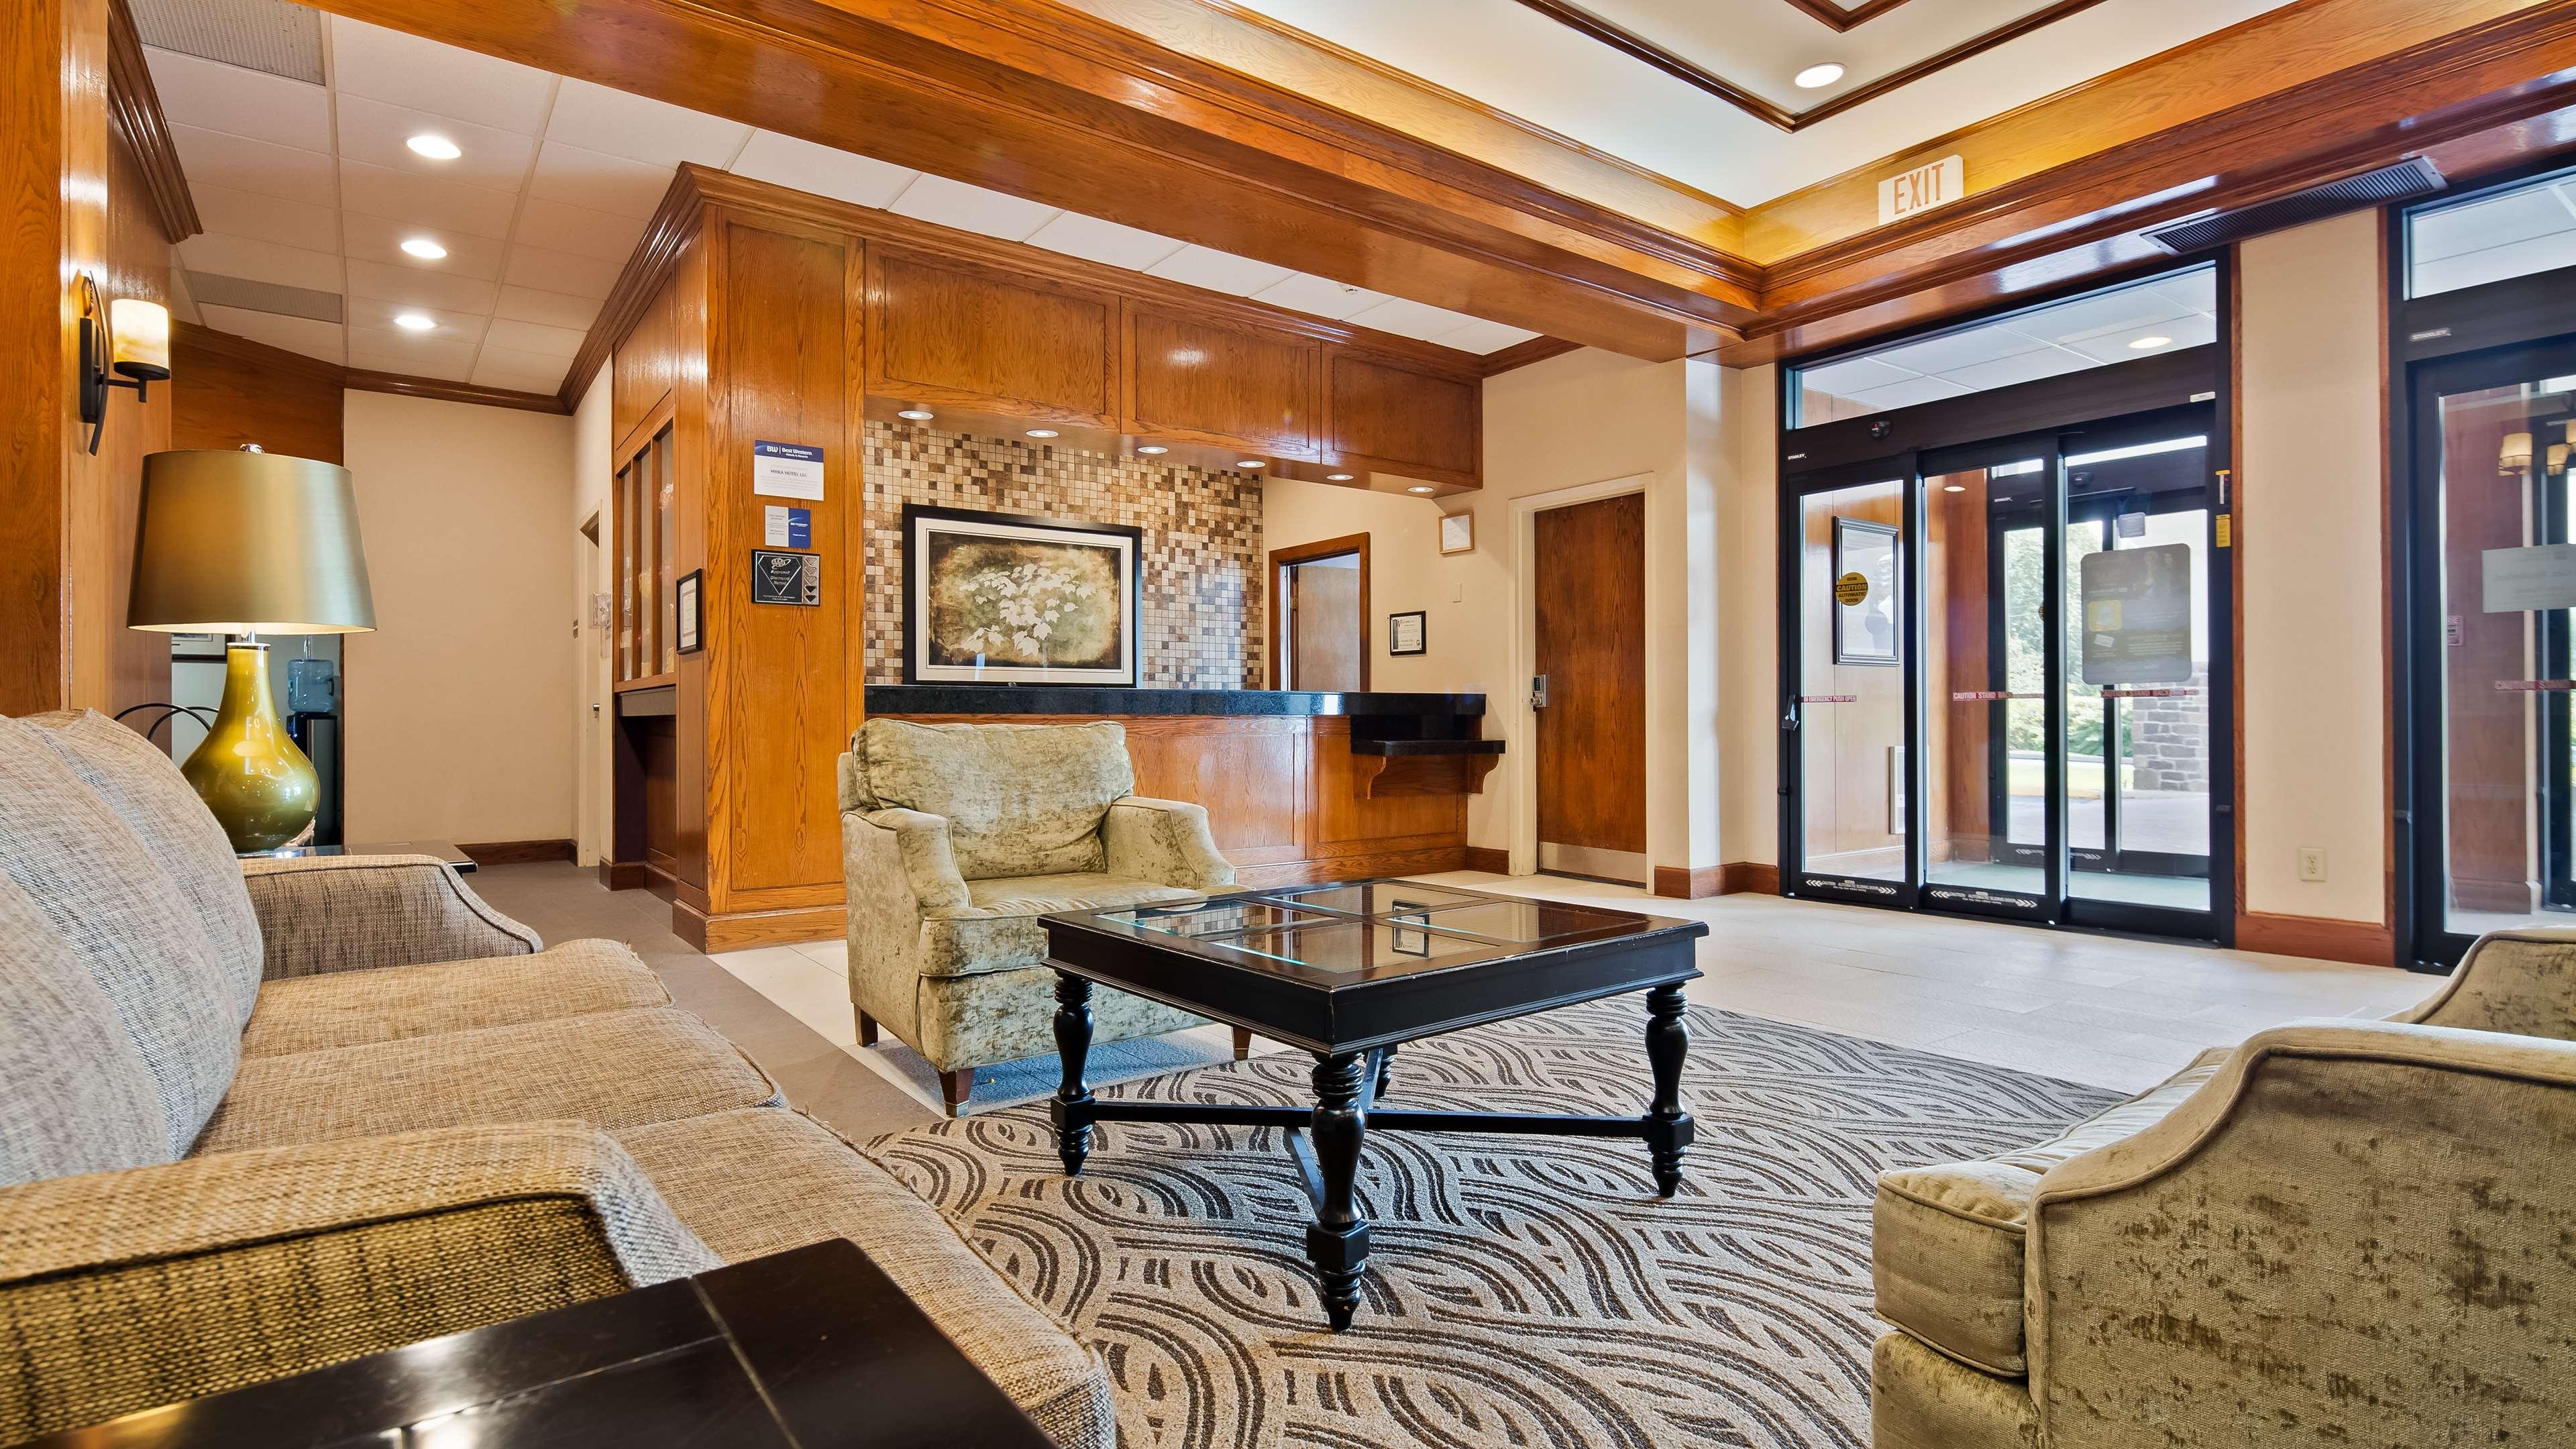 Best Western Plus North Haven Hotel image 3